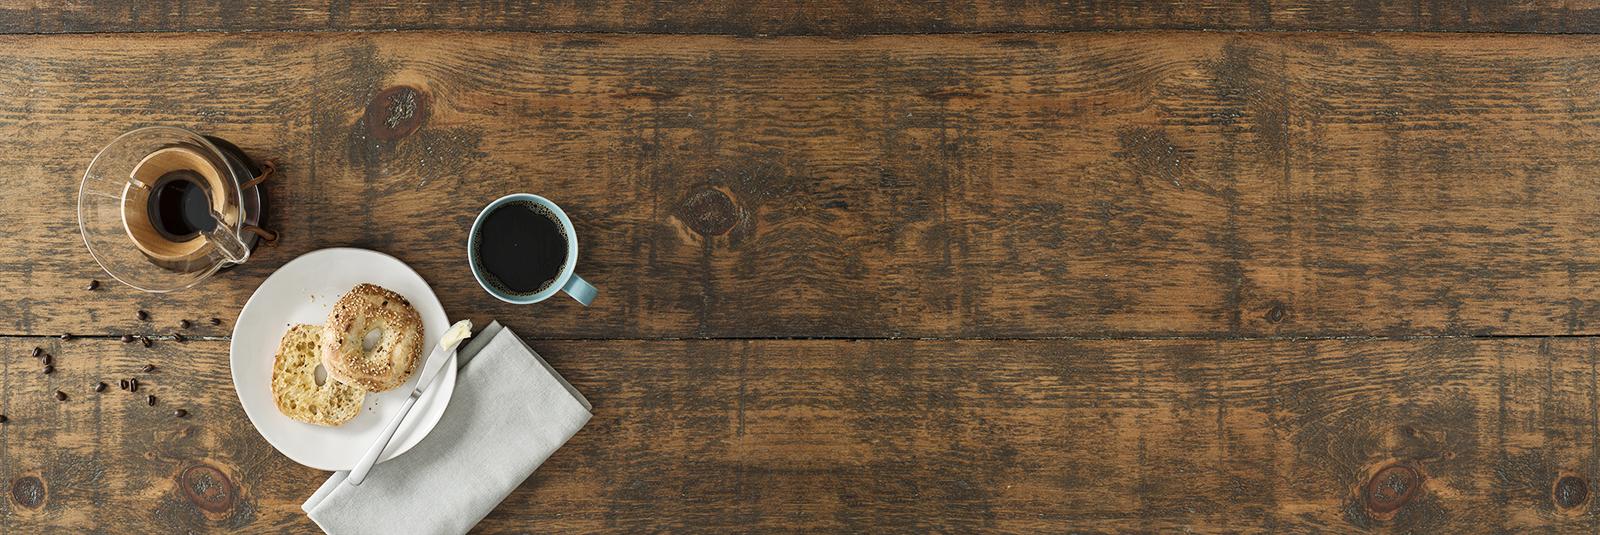 COFFEE LOVES COMPANY -